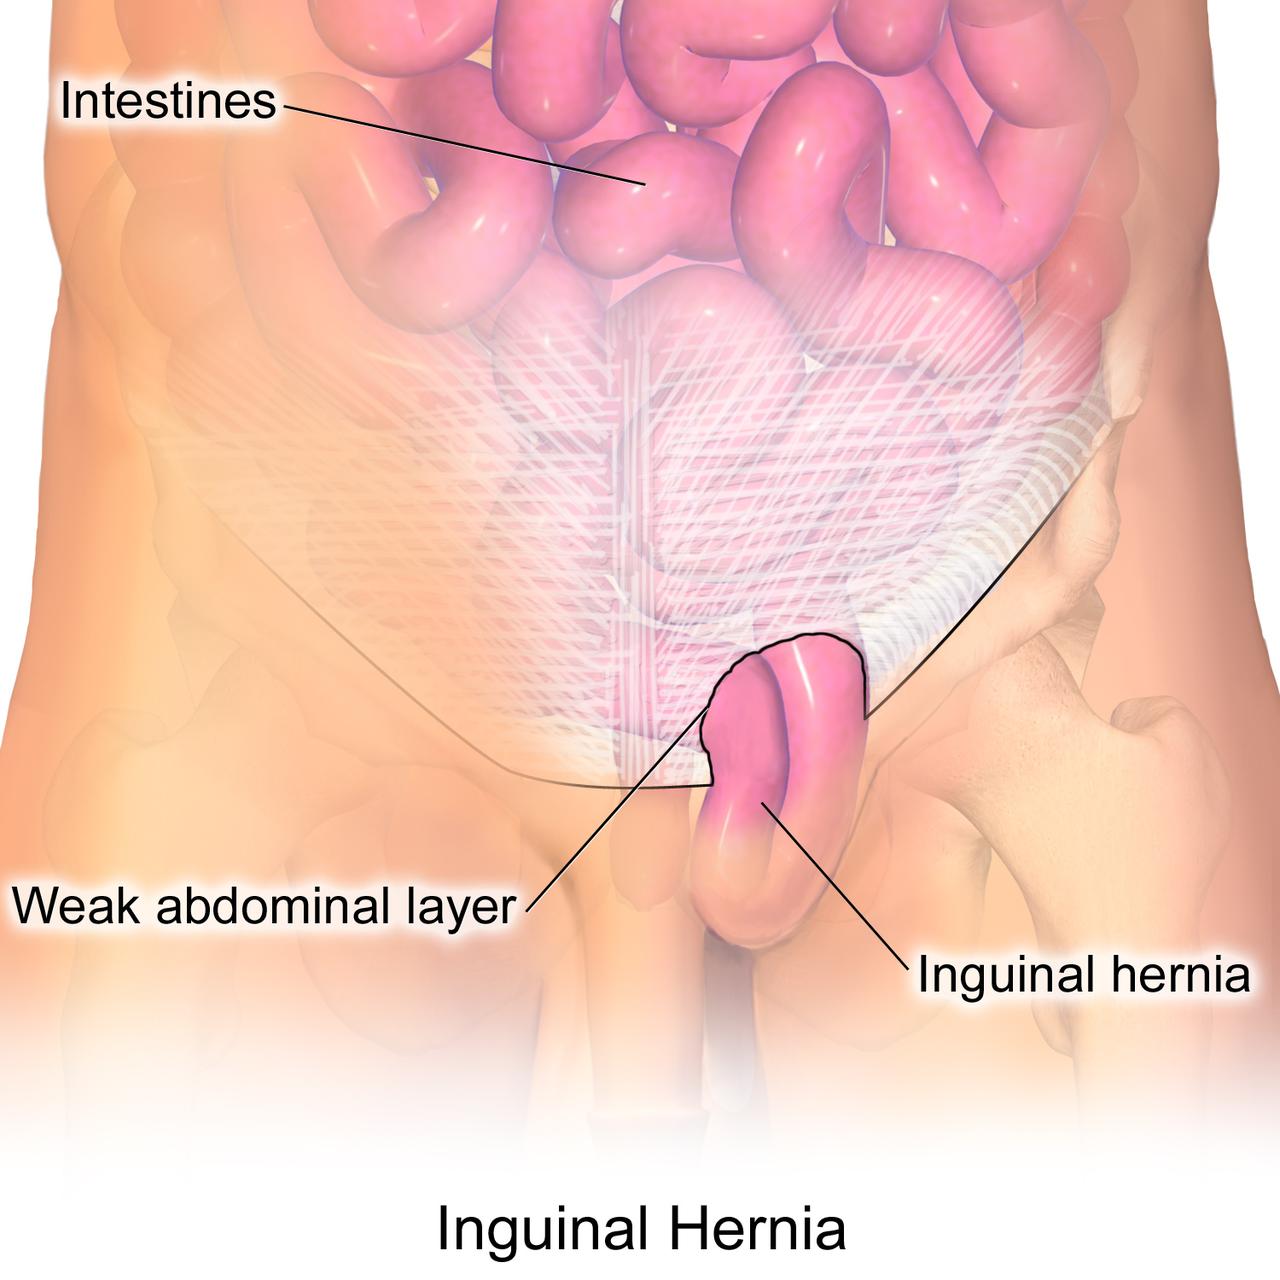 Gastrointestinal Surgery Inguinal Hernia